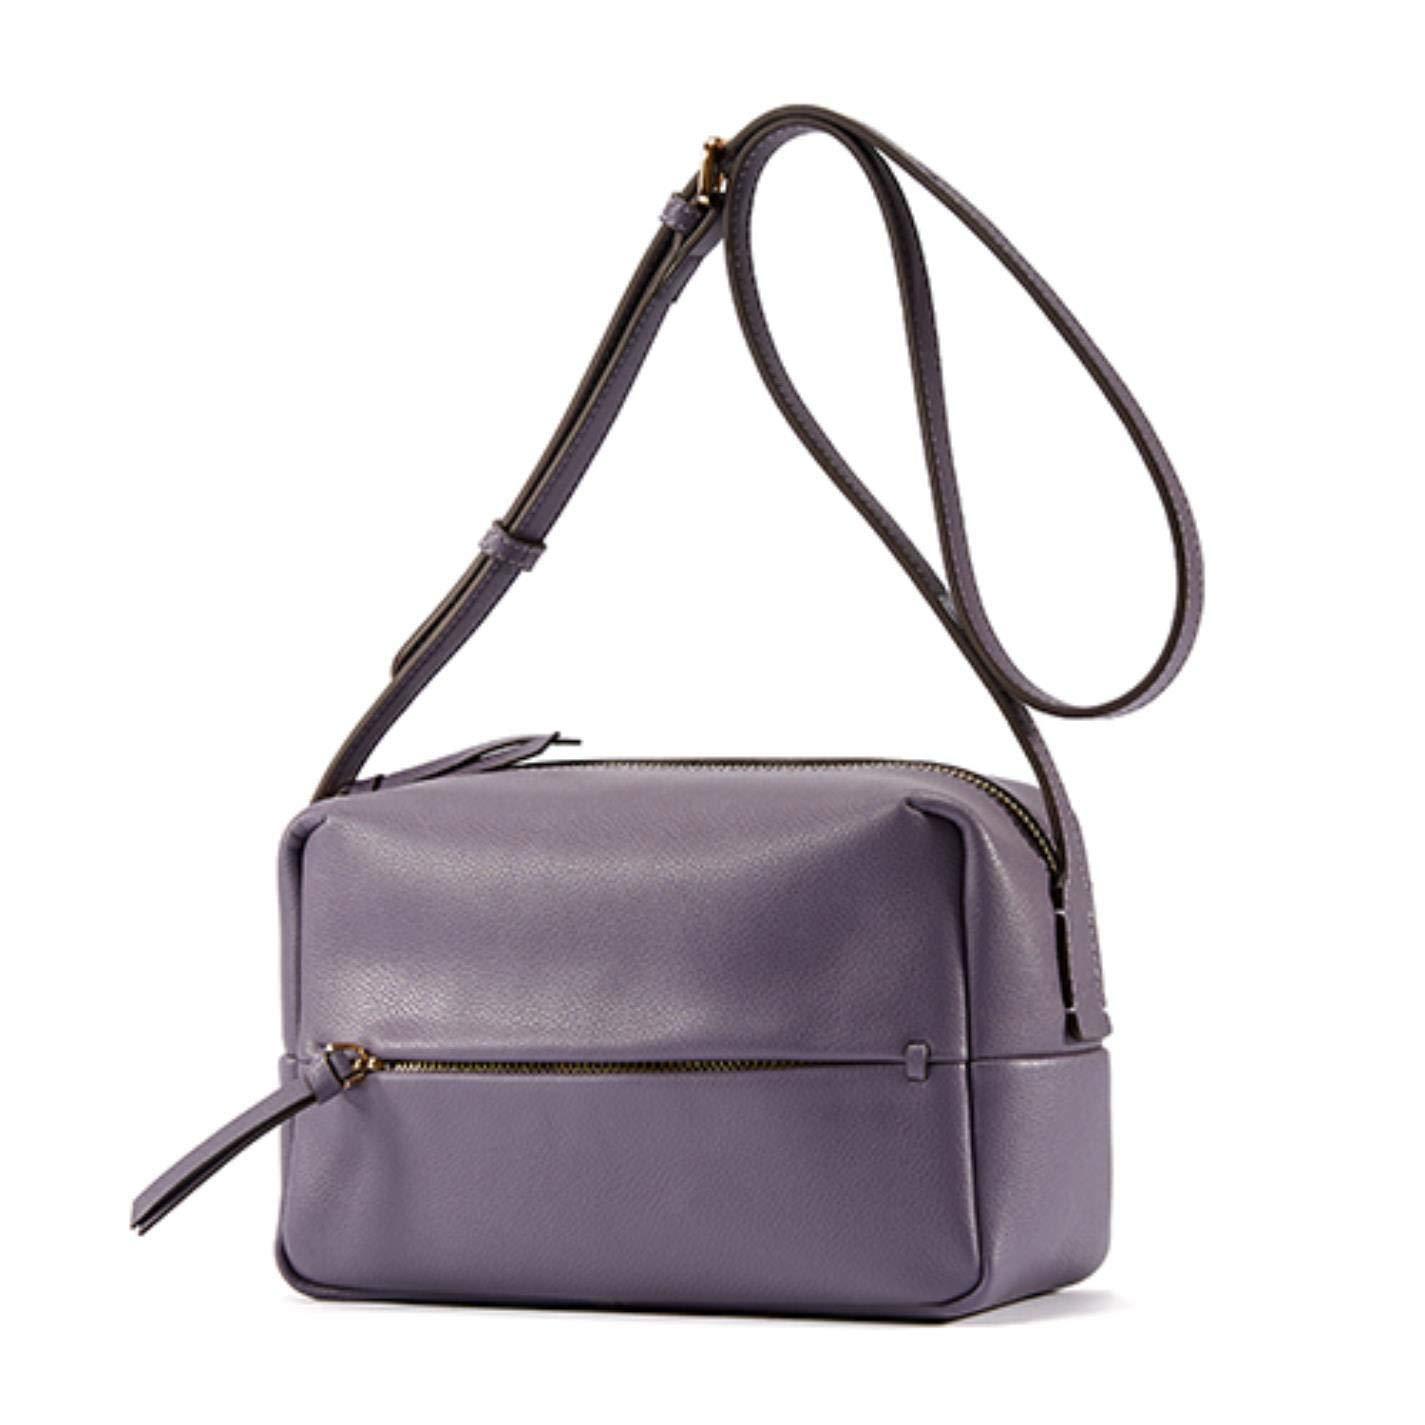 Women's split leather simple style shoulder bag